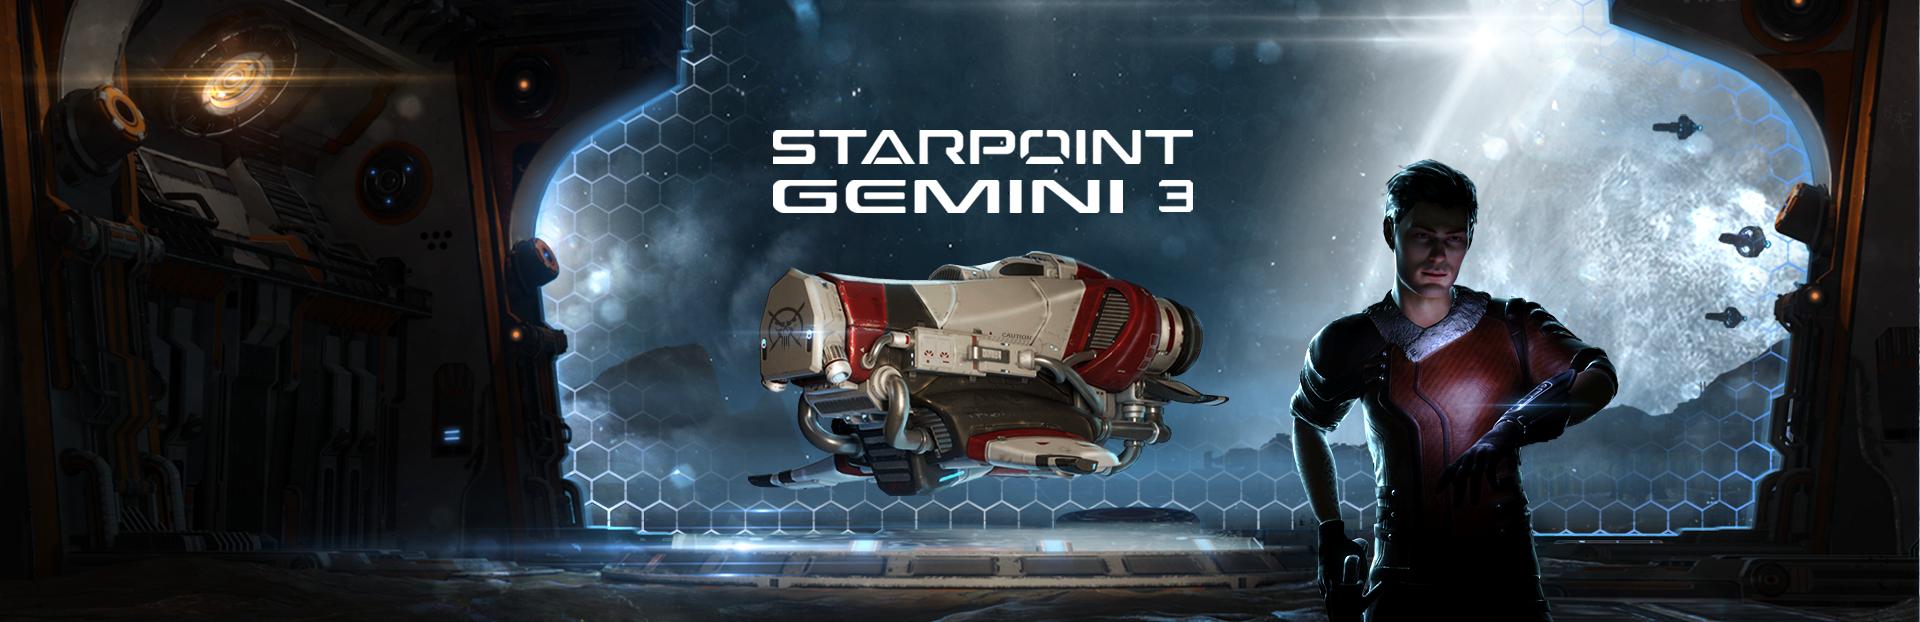 Starpoint Gemini 3 Header